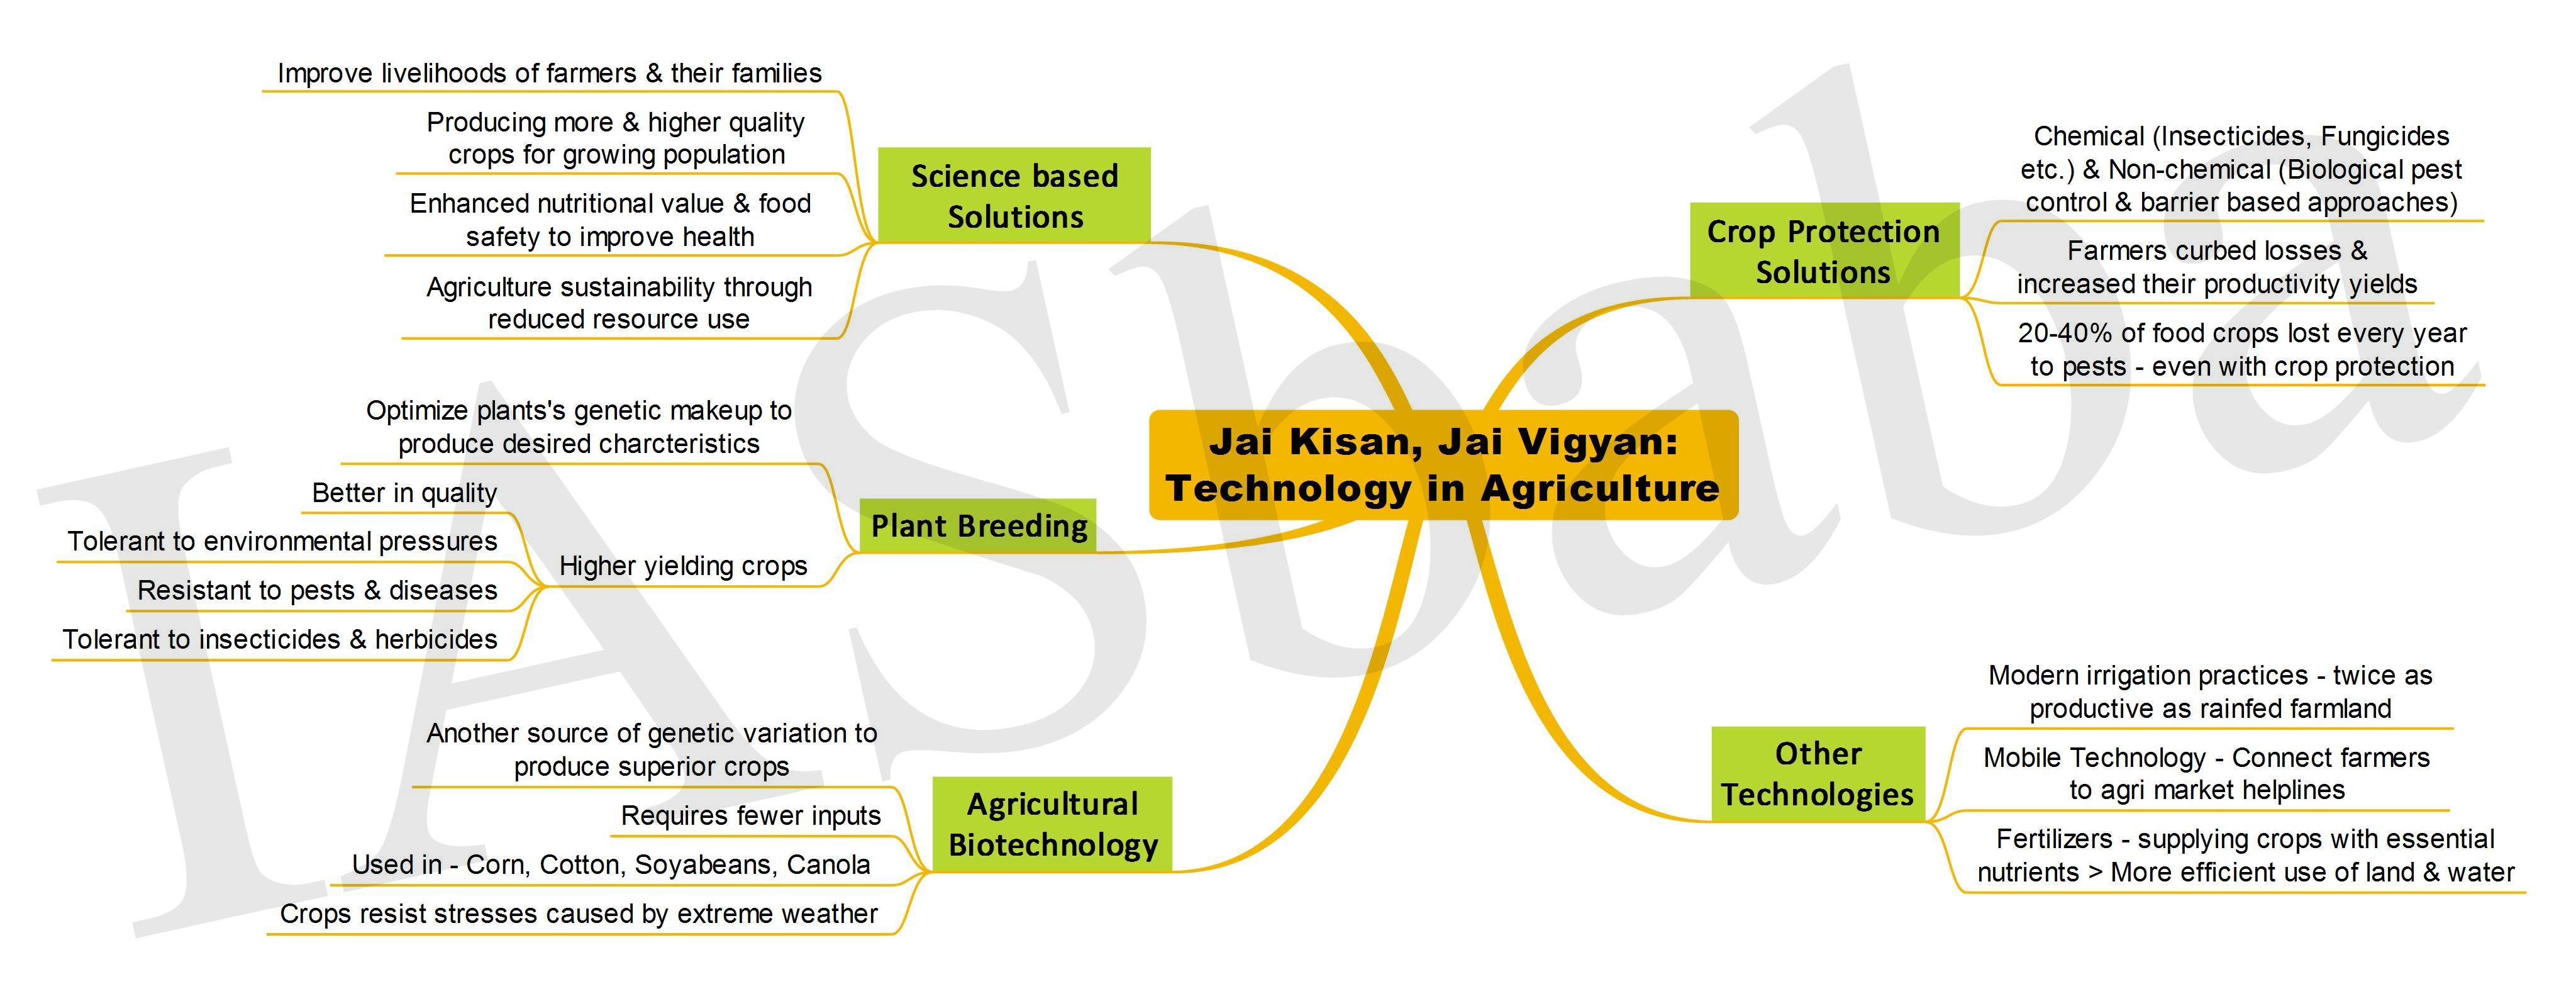 Jai Kisan Jai Vigyan Technology in Agriculture-IASbaba